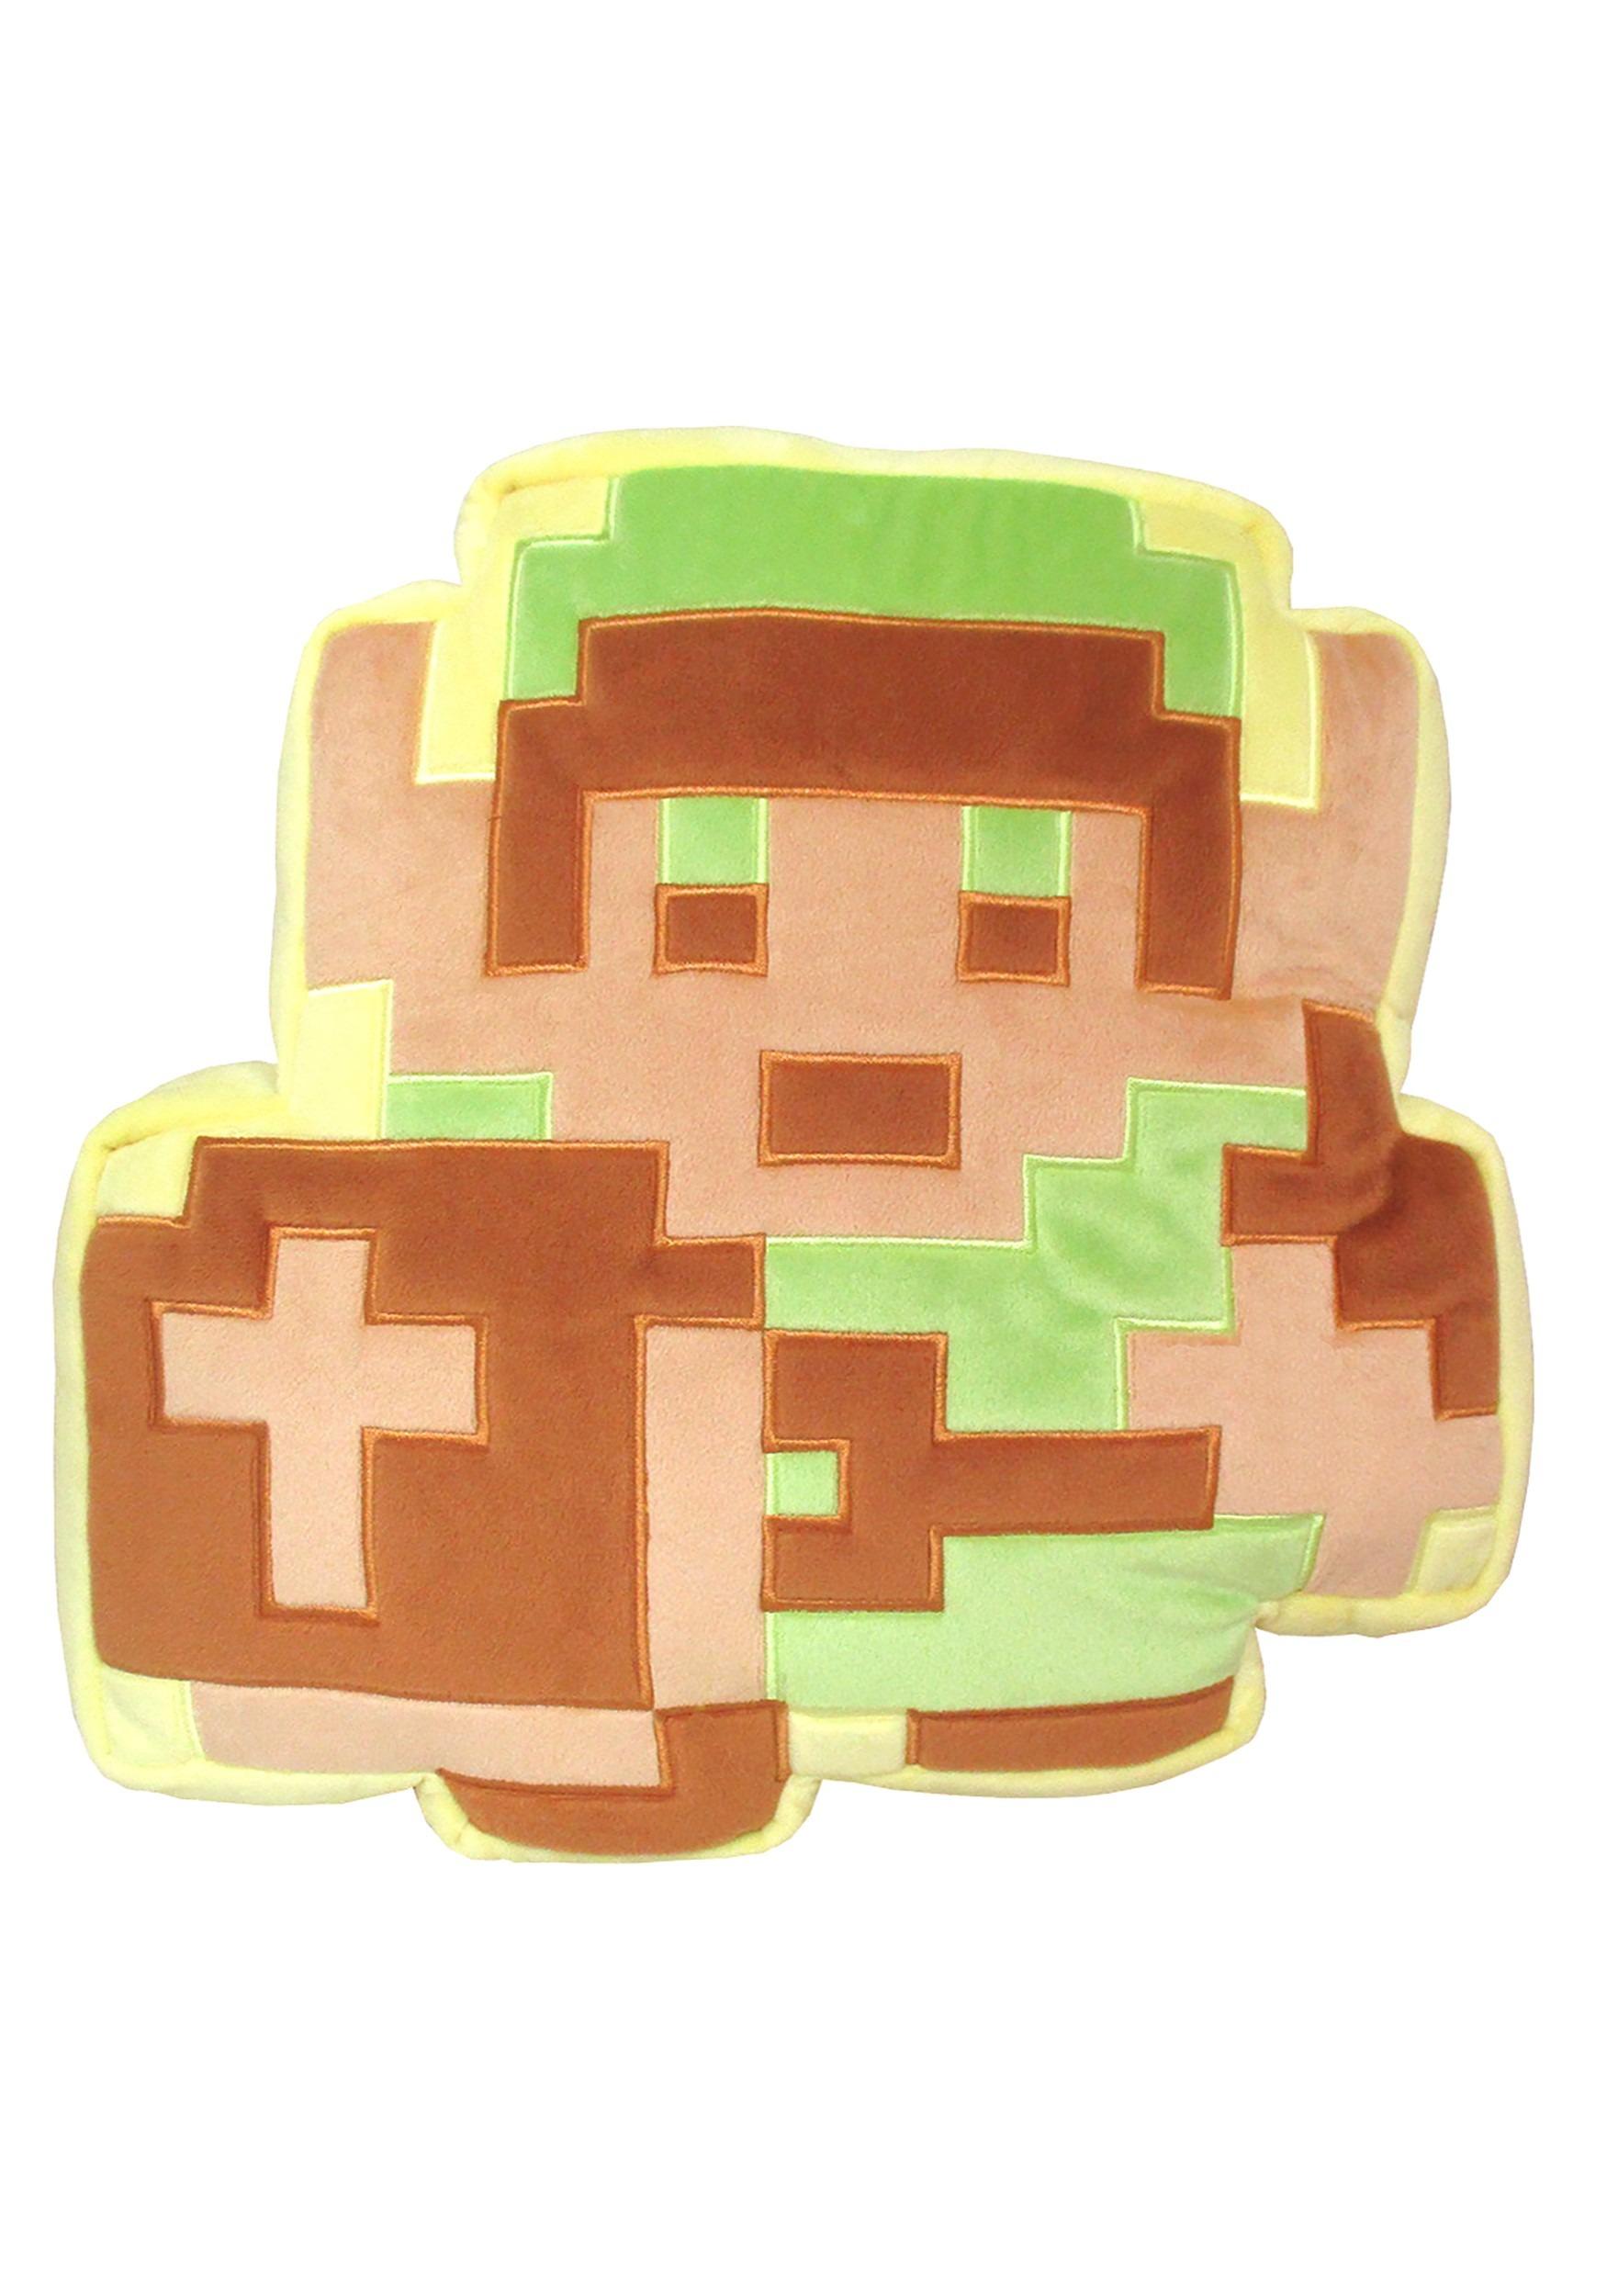 Legend of Zelda Link Stuffed Toy